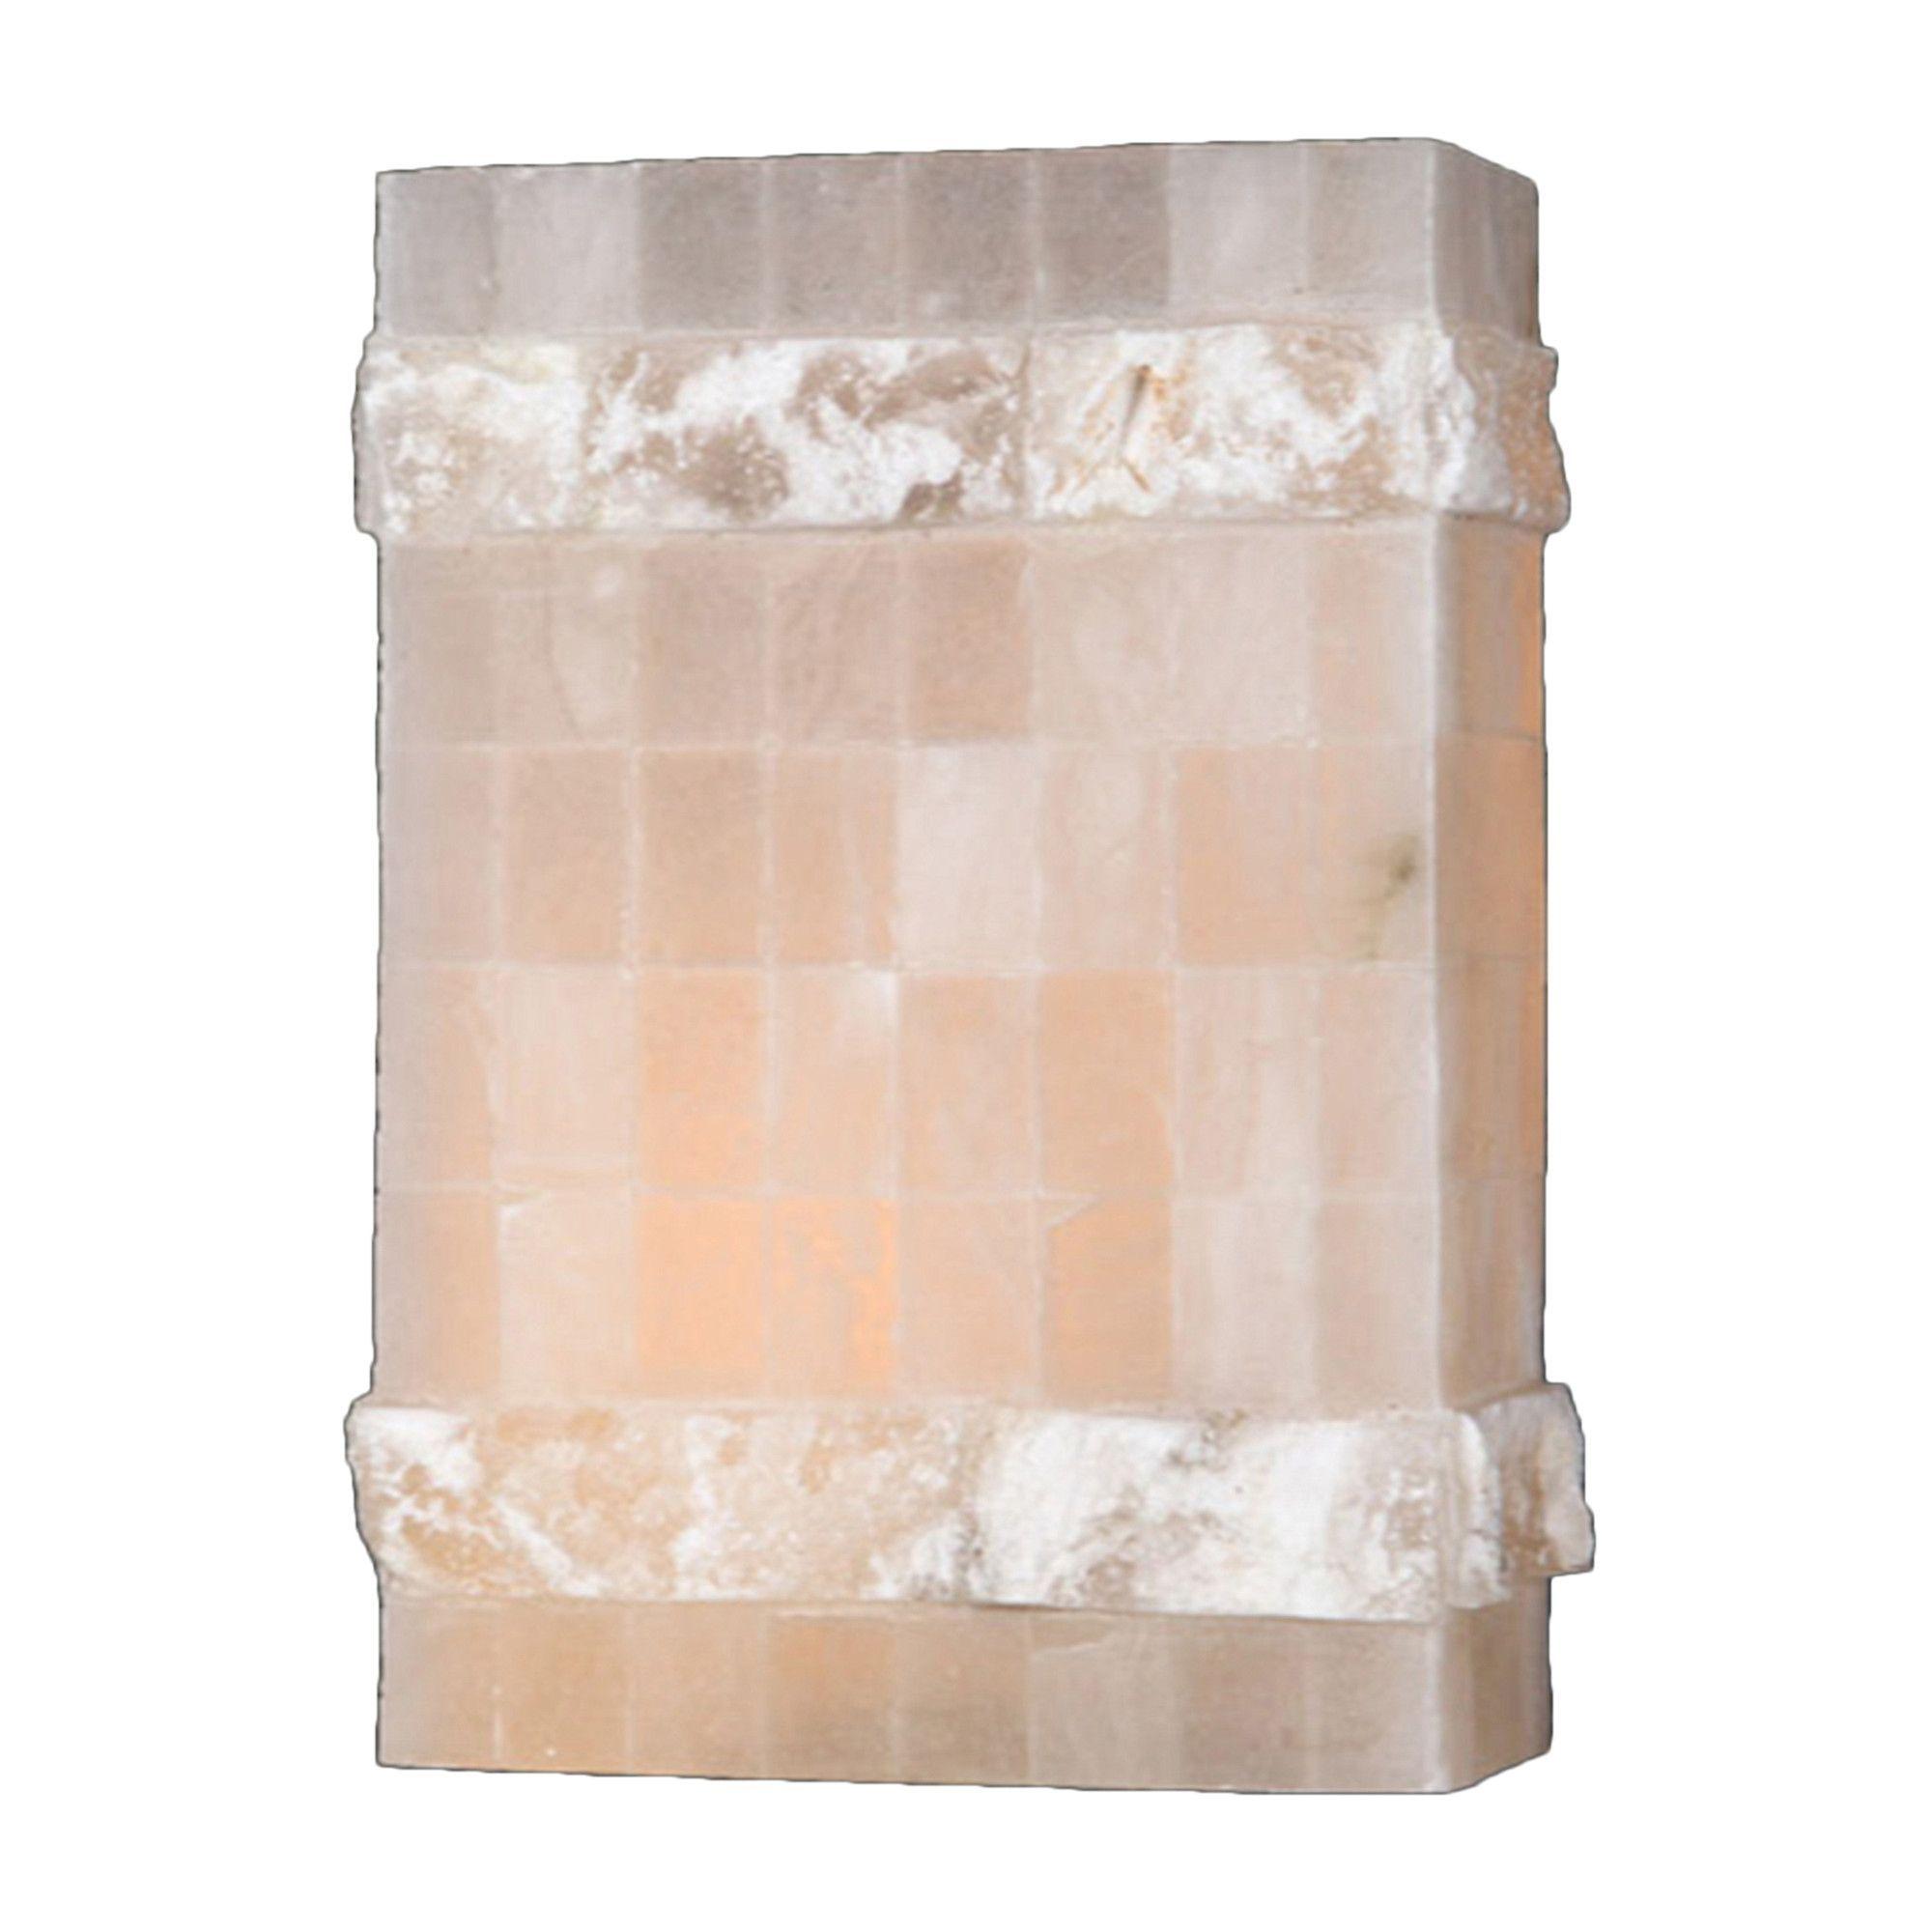 Pompeii 1 Light Wall Sconce